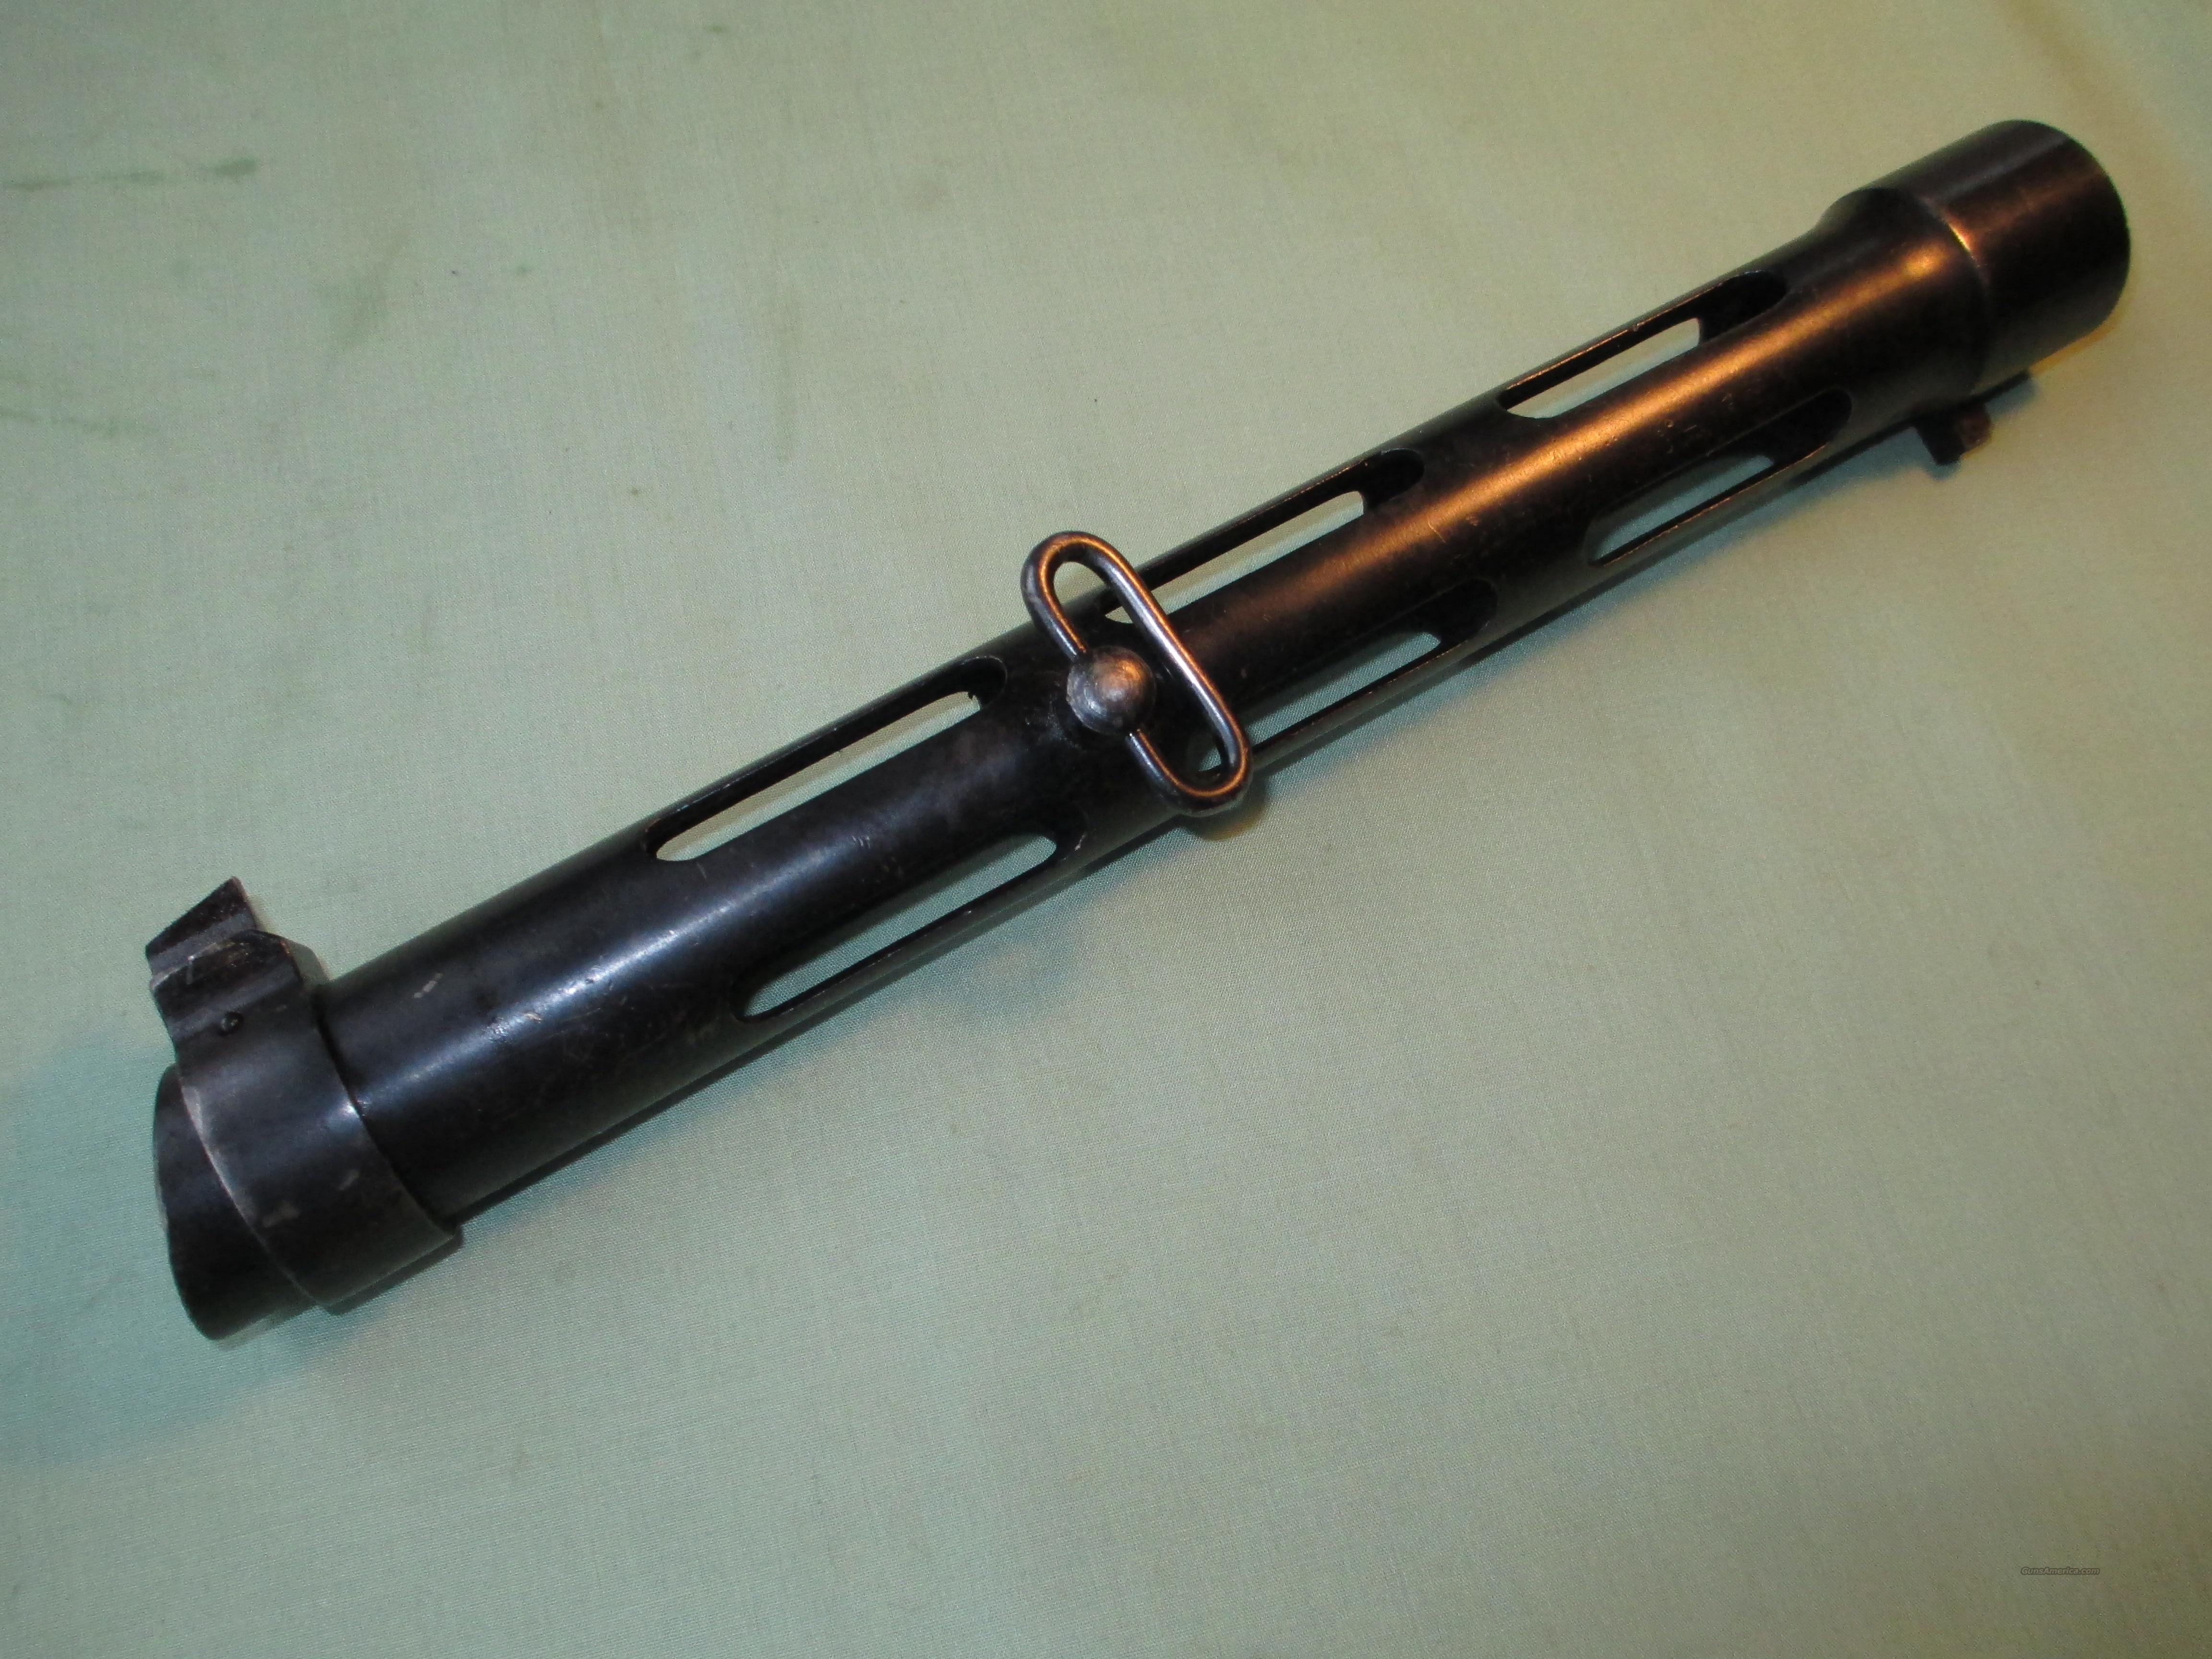 Wwii Finnish Suomi Kp 31 M31 M 31 Barrel Shroud For Sale